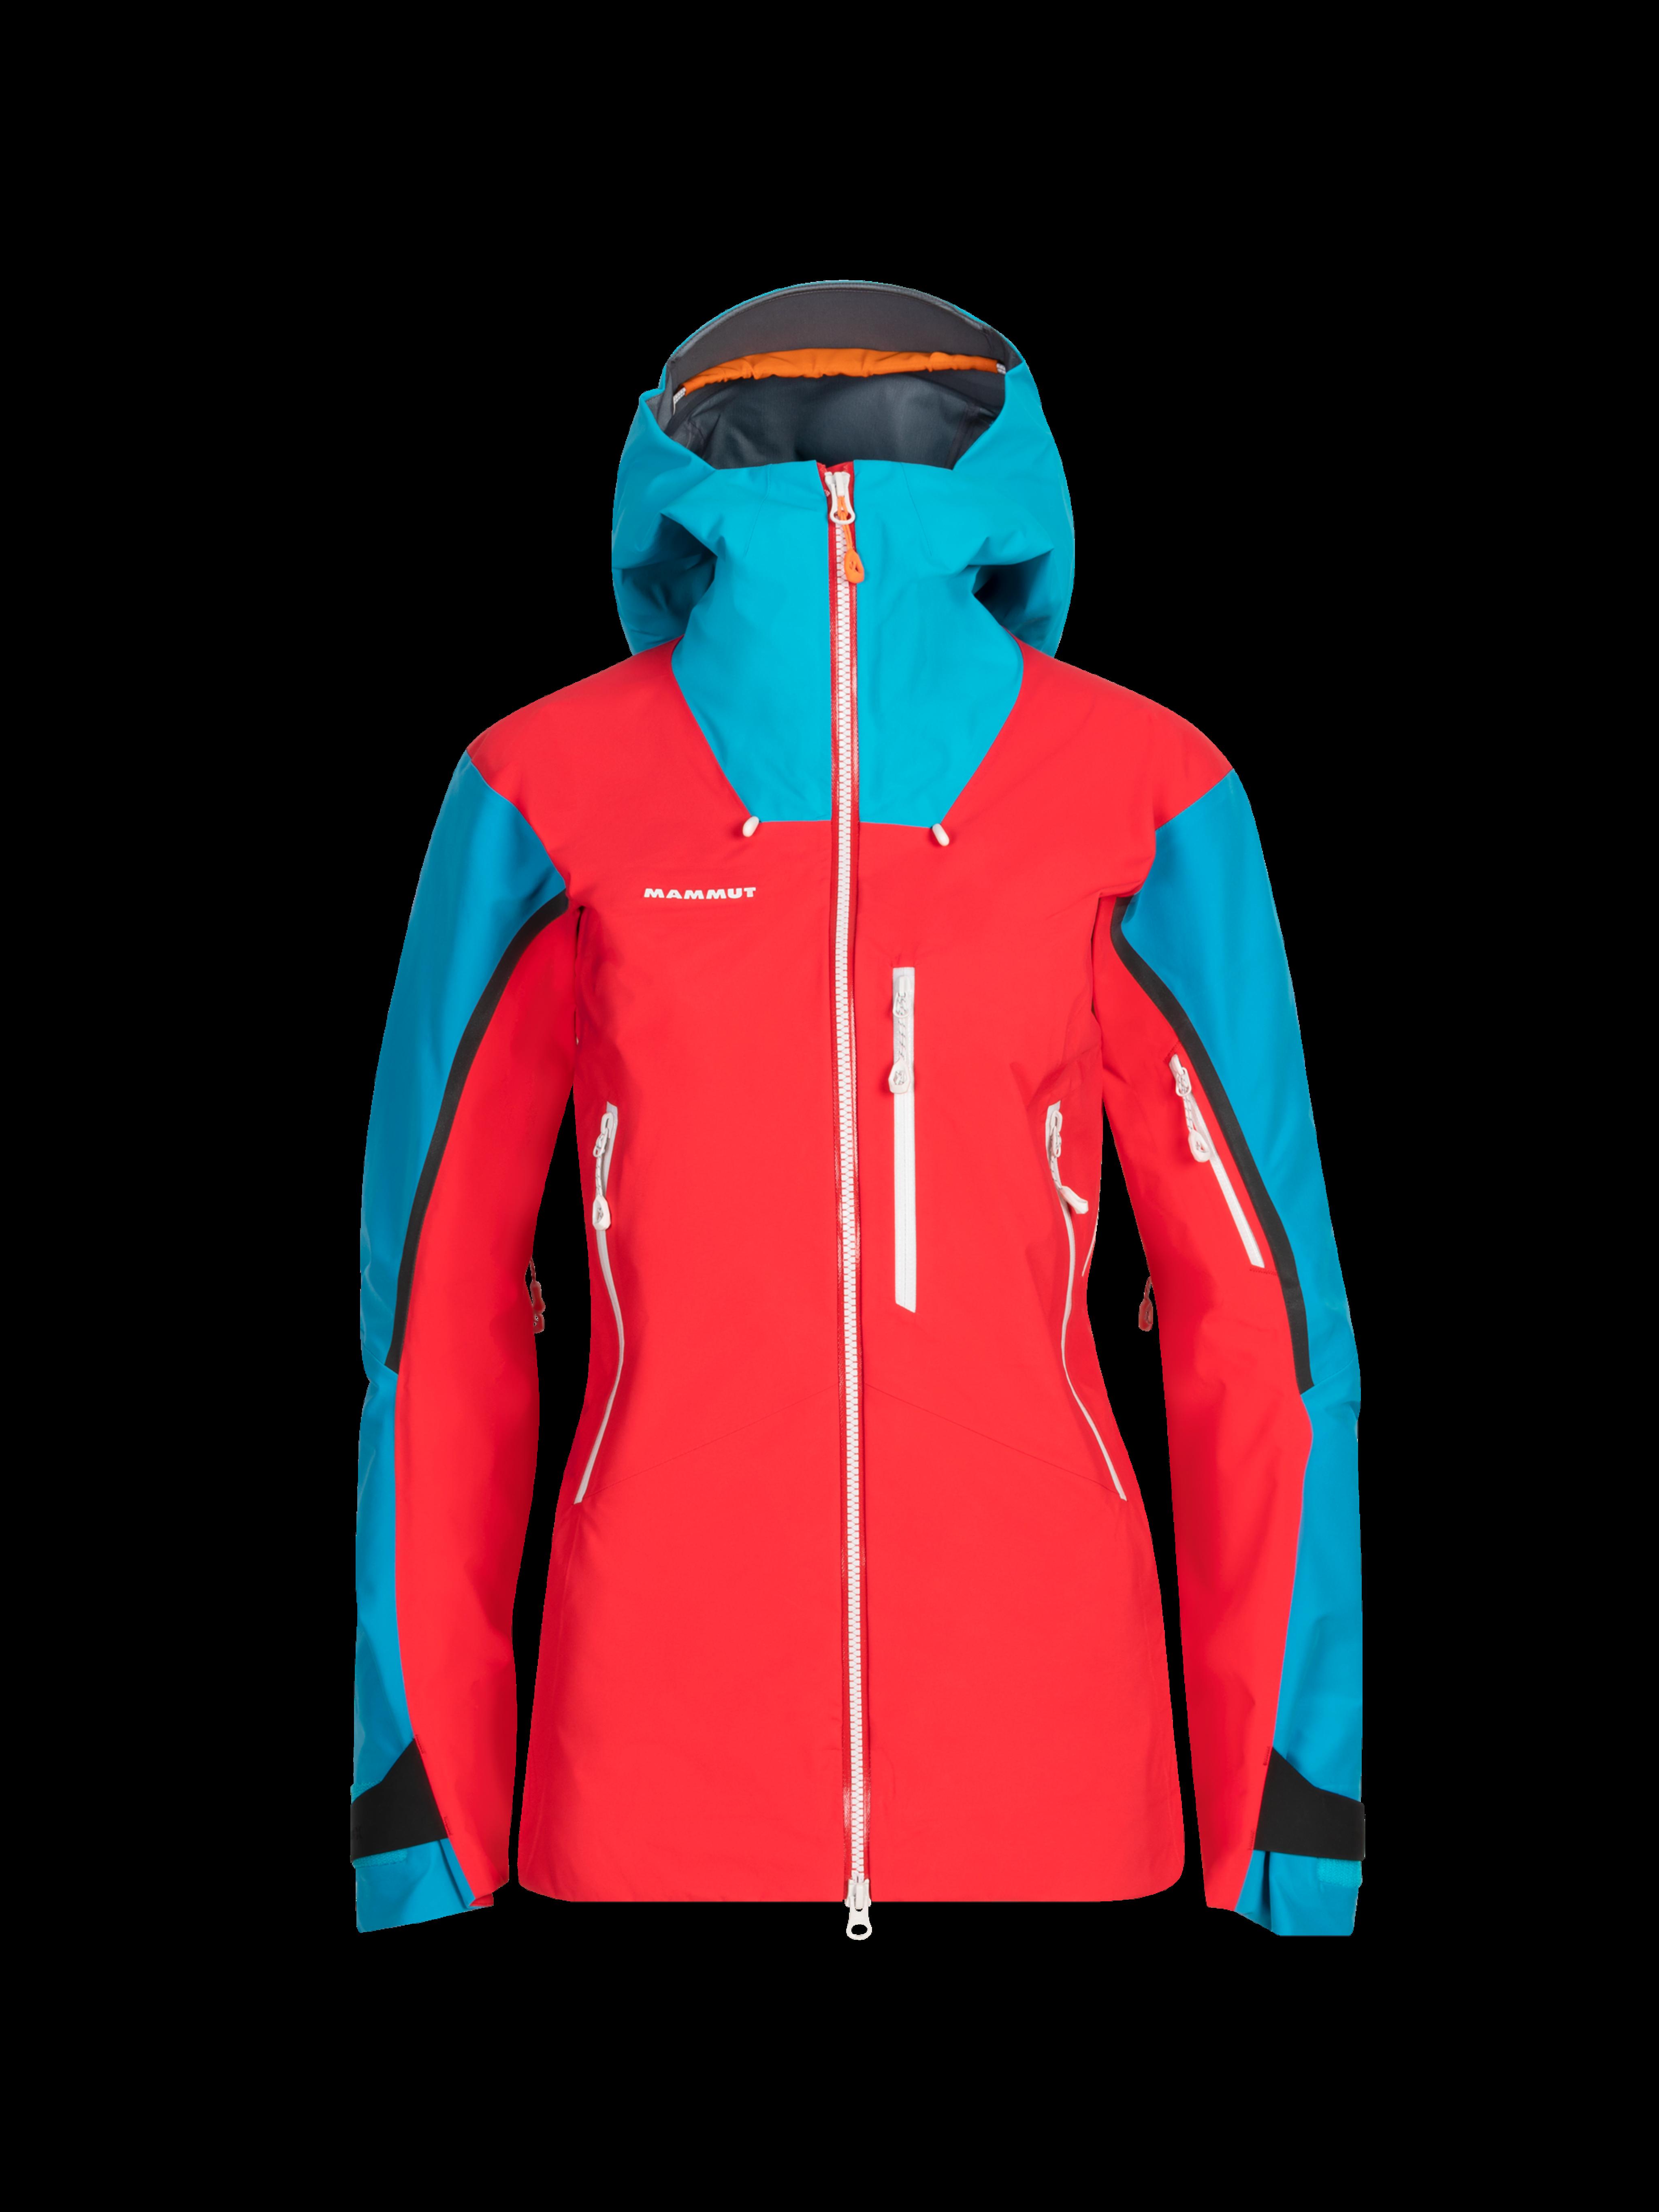 Nordwand Pro HS Hooded Jacket Women product image